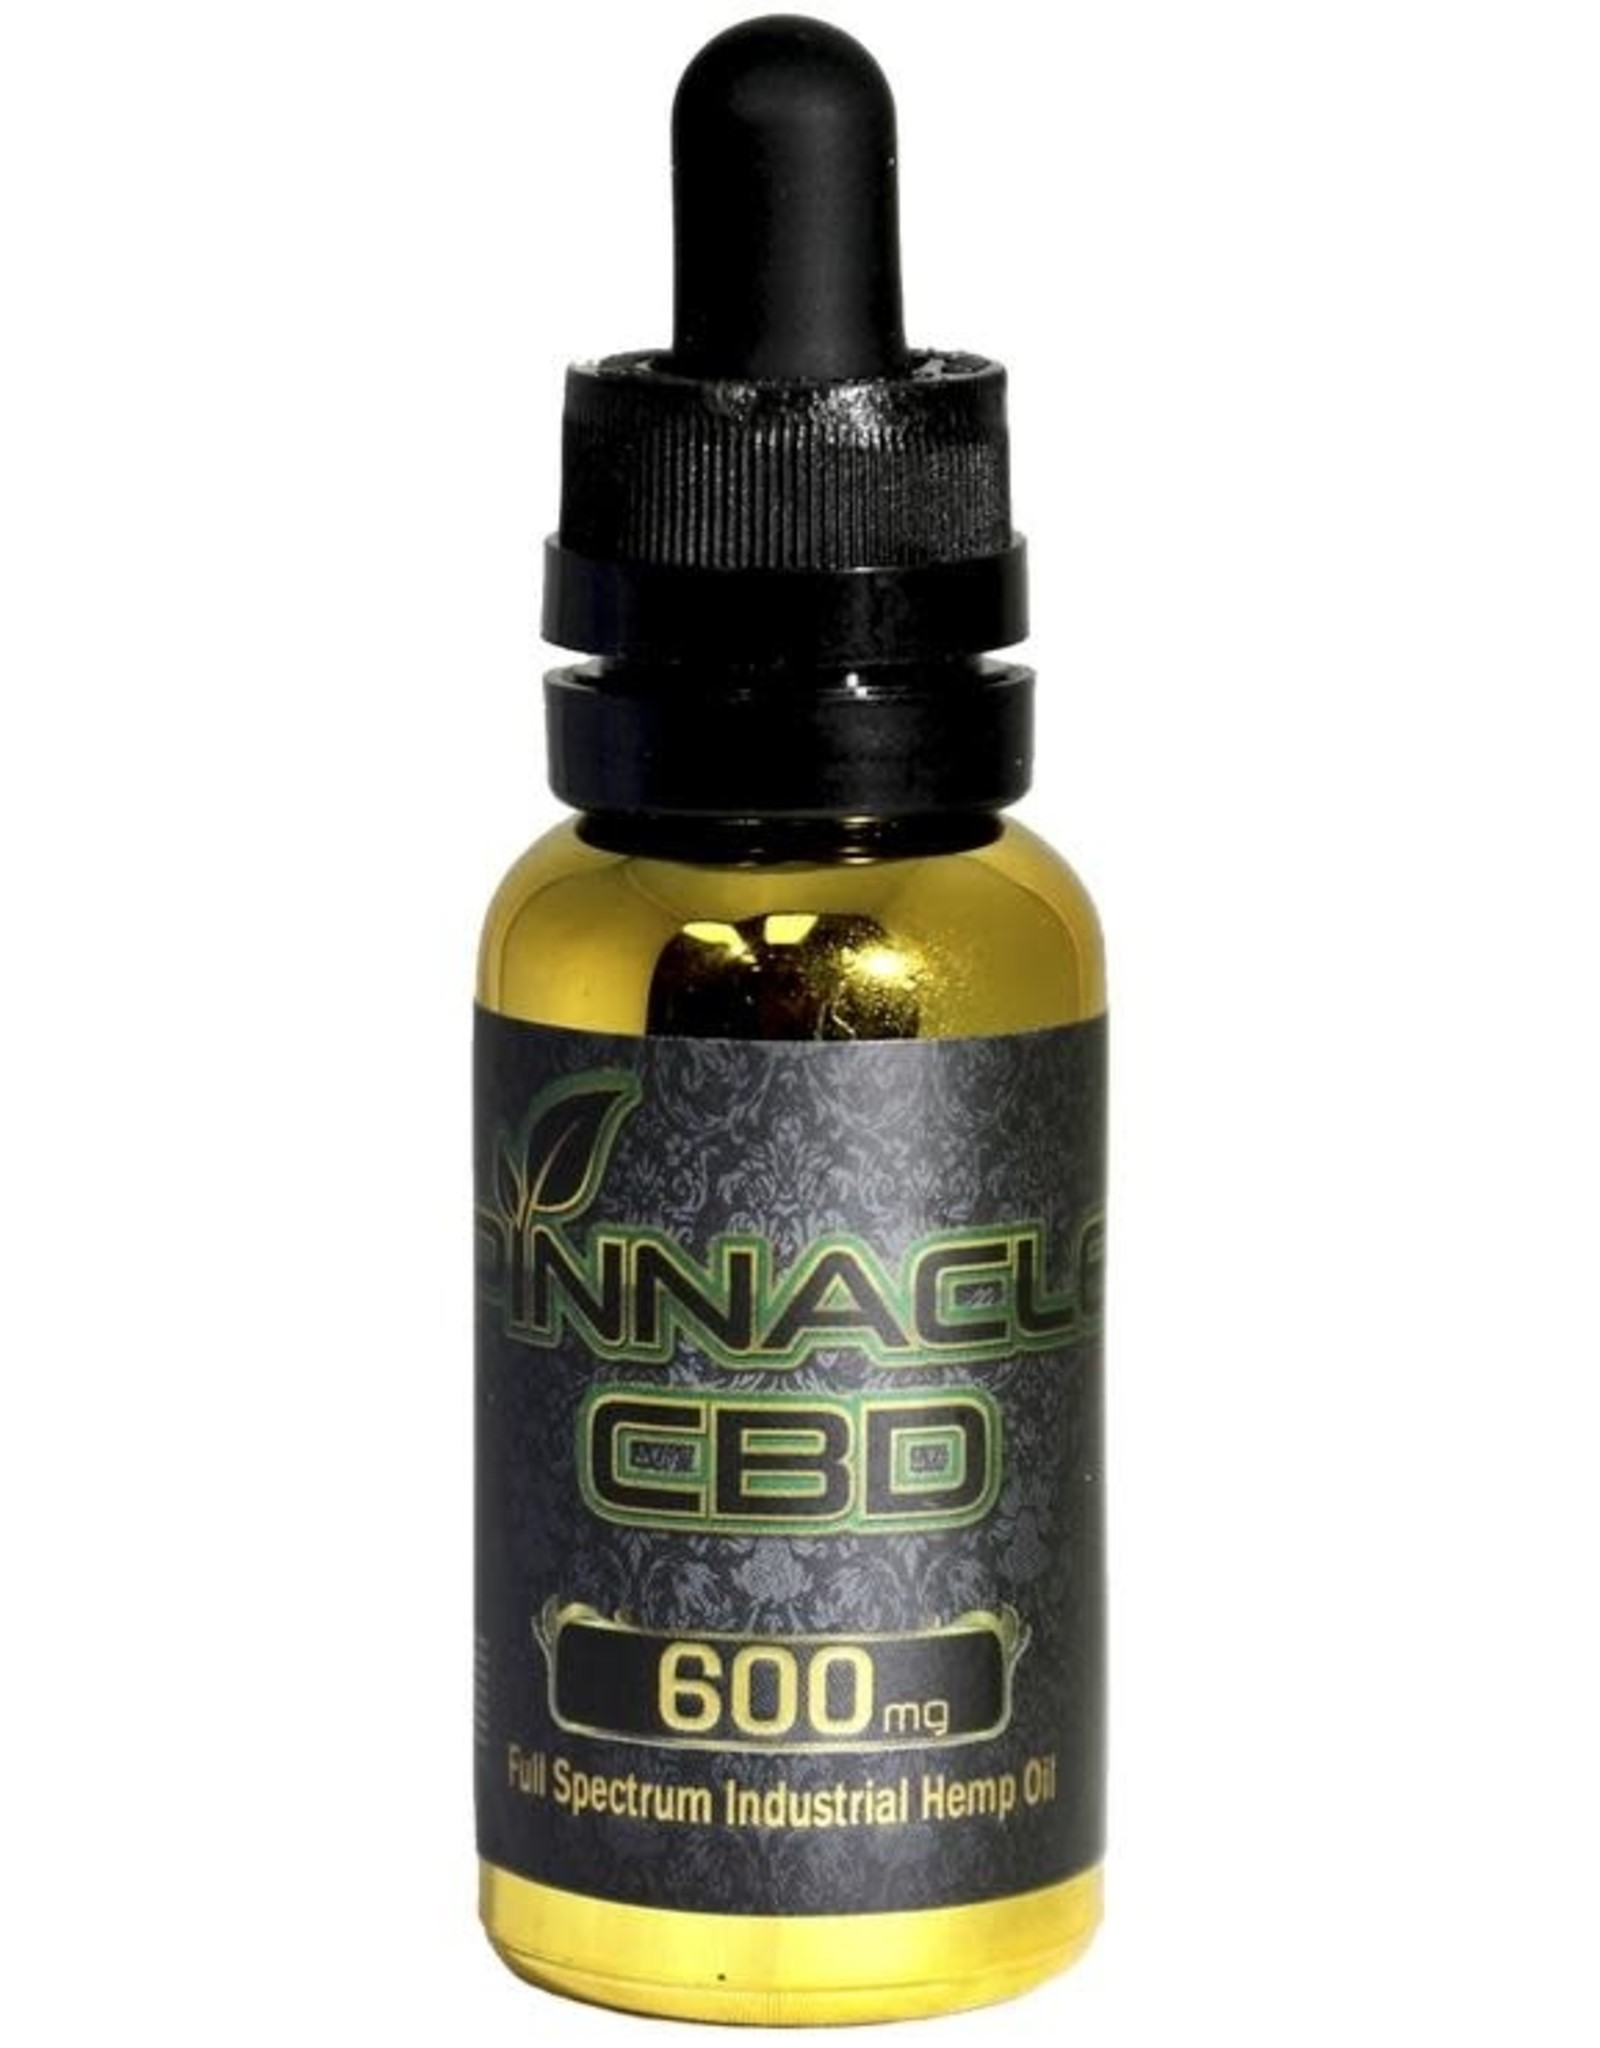 Pinnacle Hemp Full Spectrum CBD Oil Tincture All In One 600mg